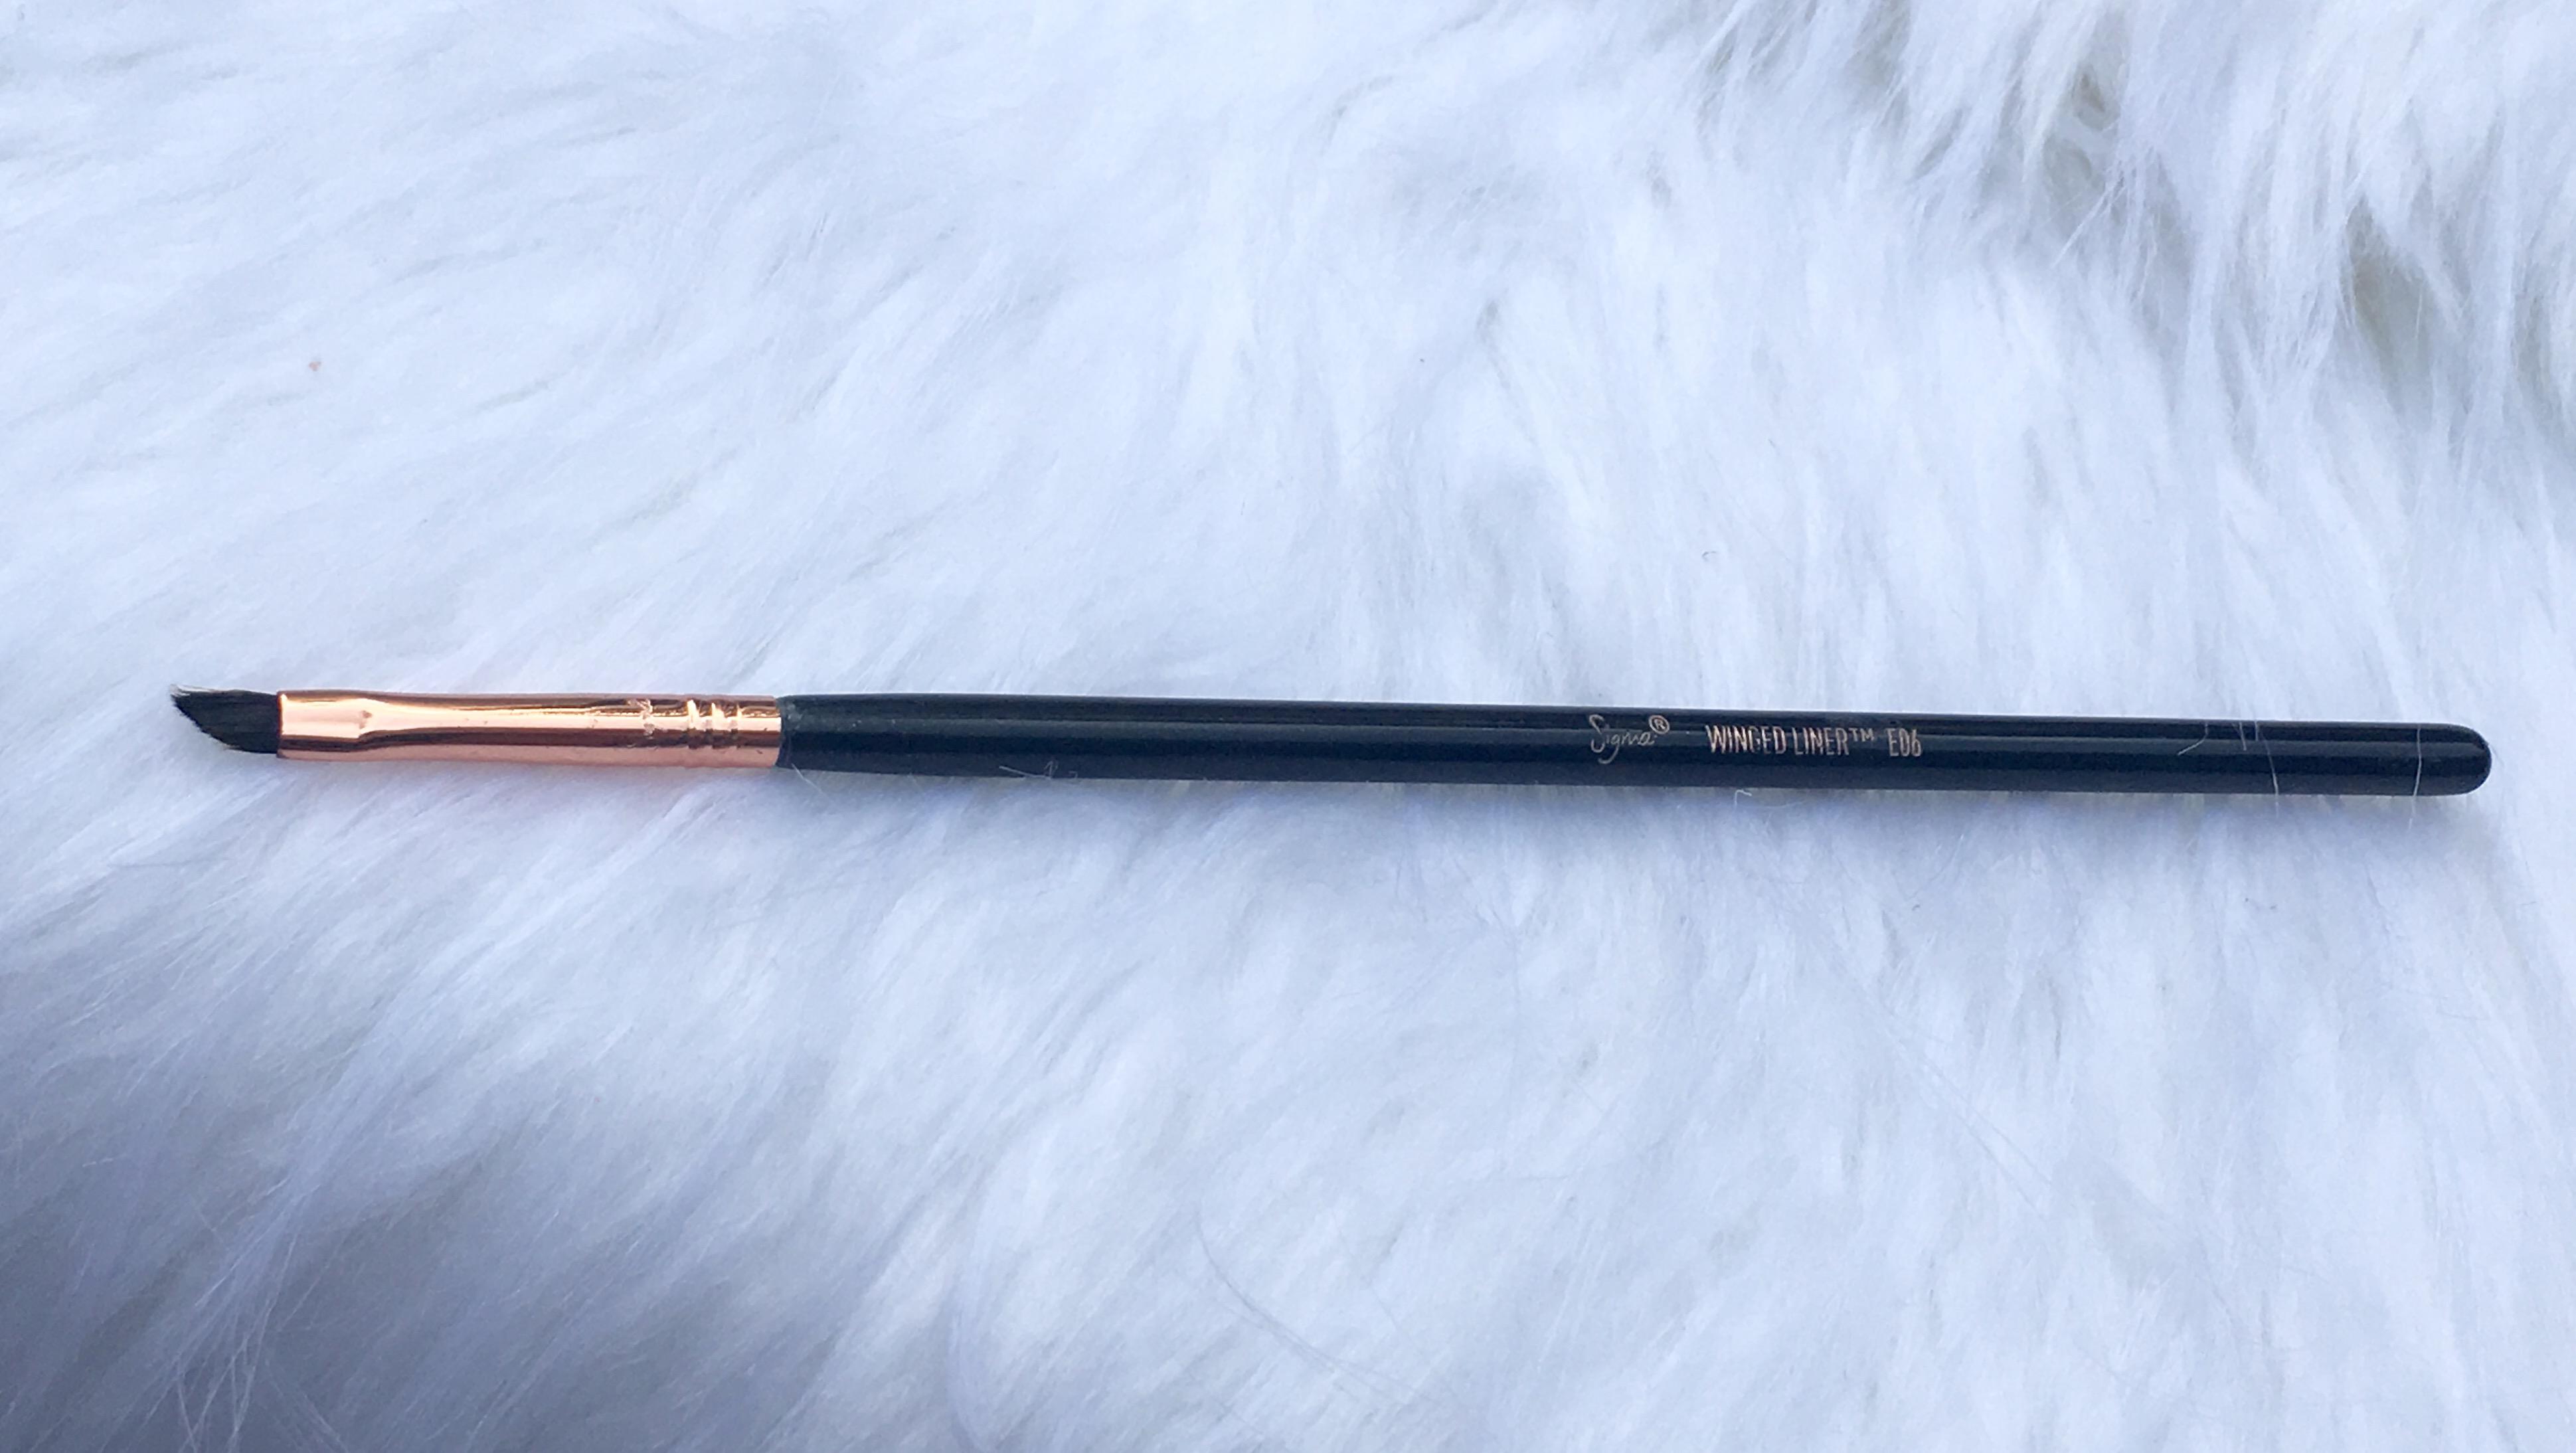 Winged Liner Brush